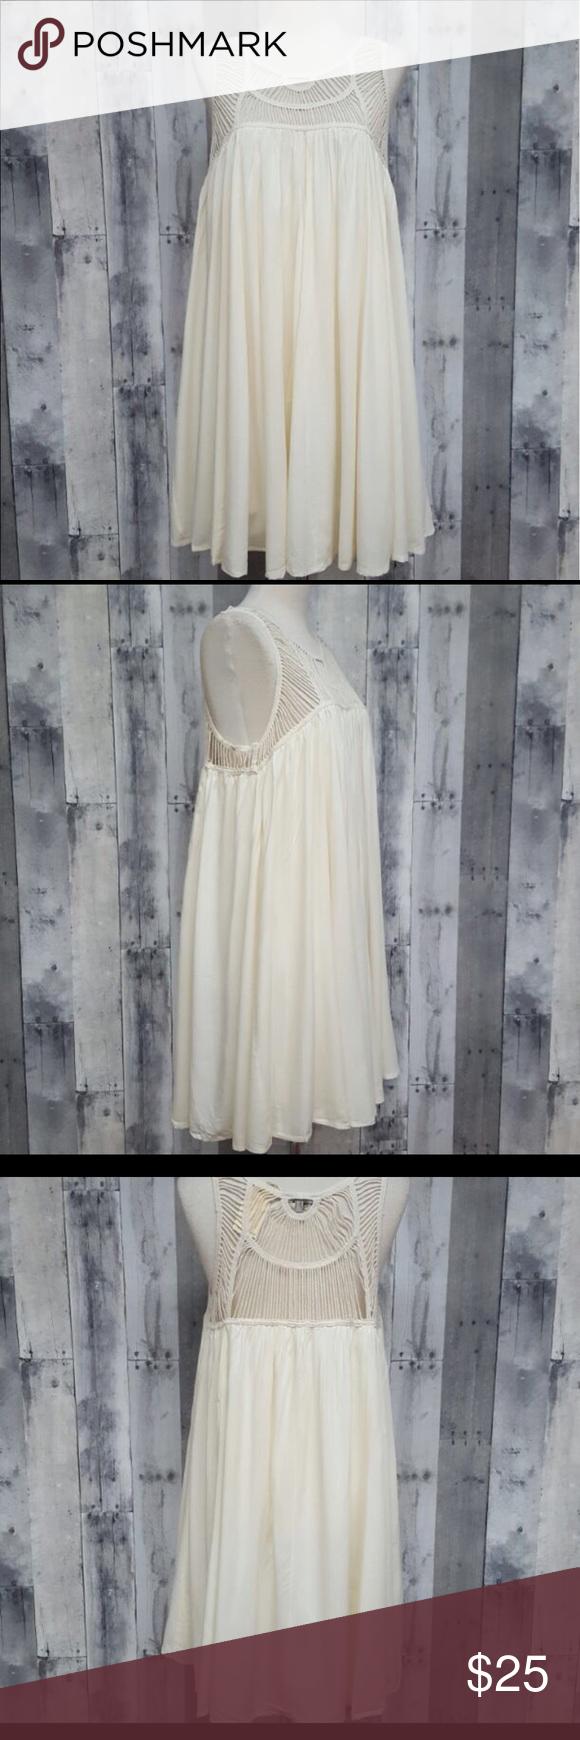 White boho dress brand new with tags dresses midi my posh